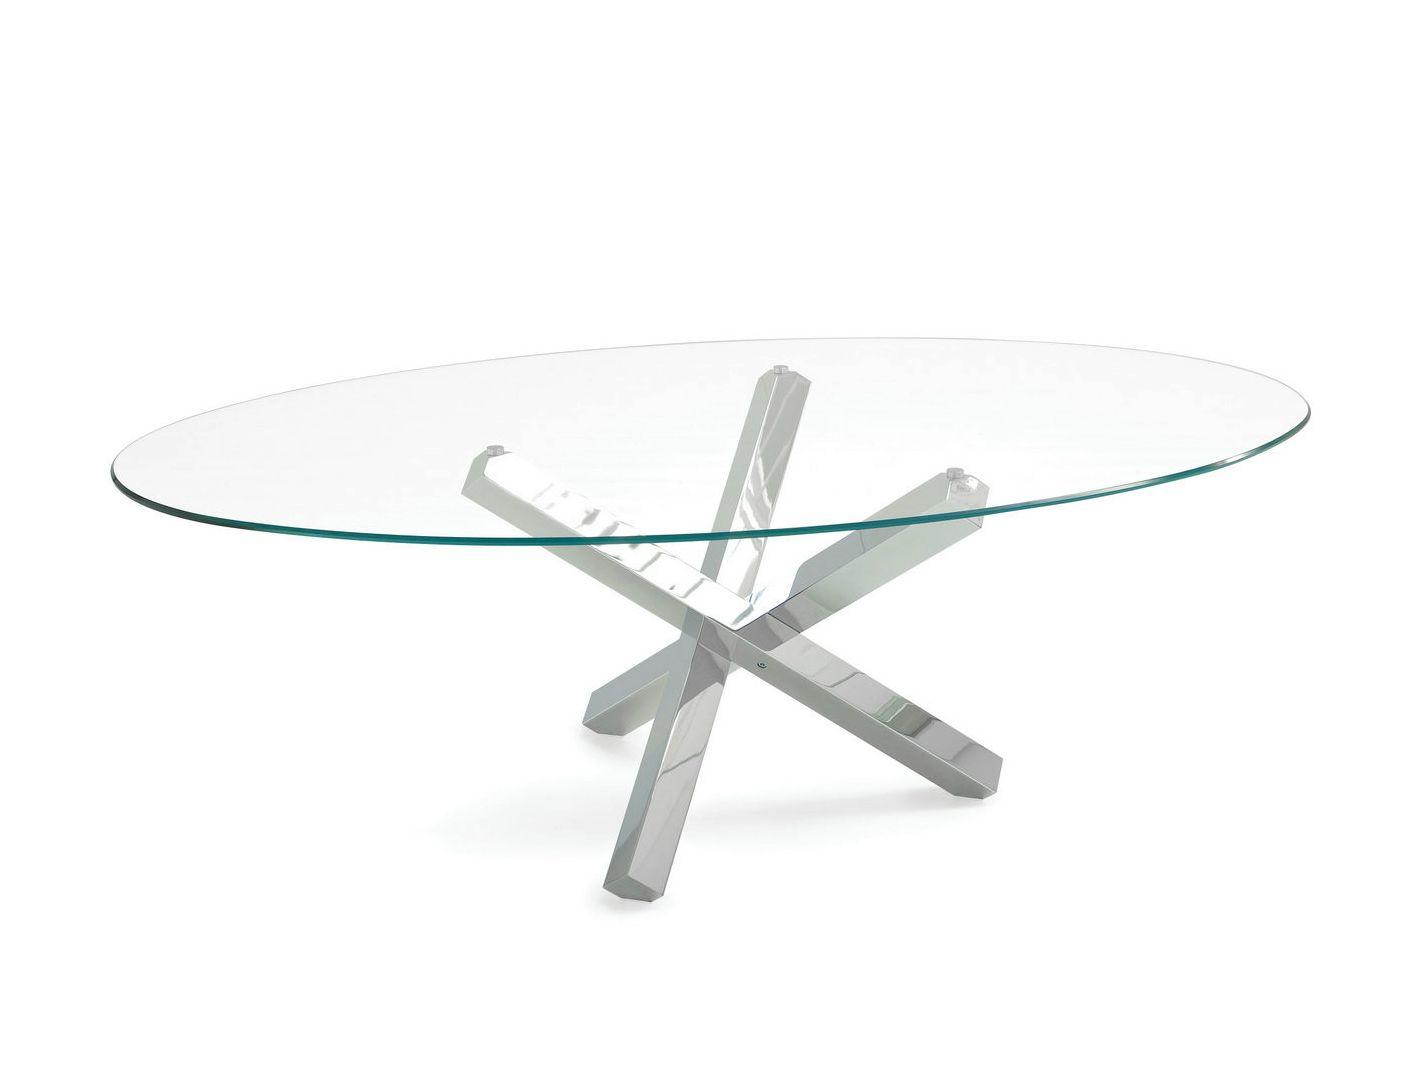 Tavolo ovale in vetro aikido elliptical by sovet italia - Tavolo in vetro ovale ...